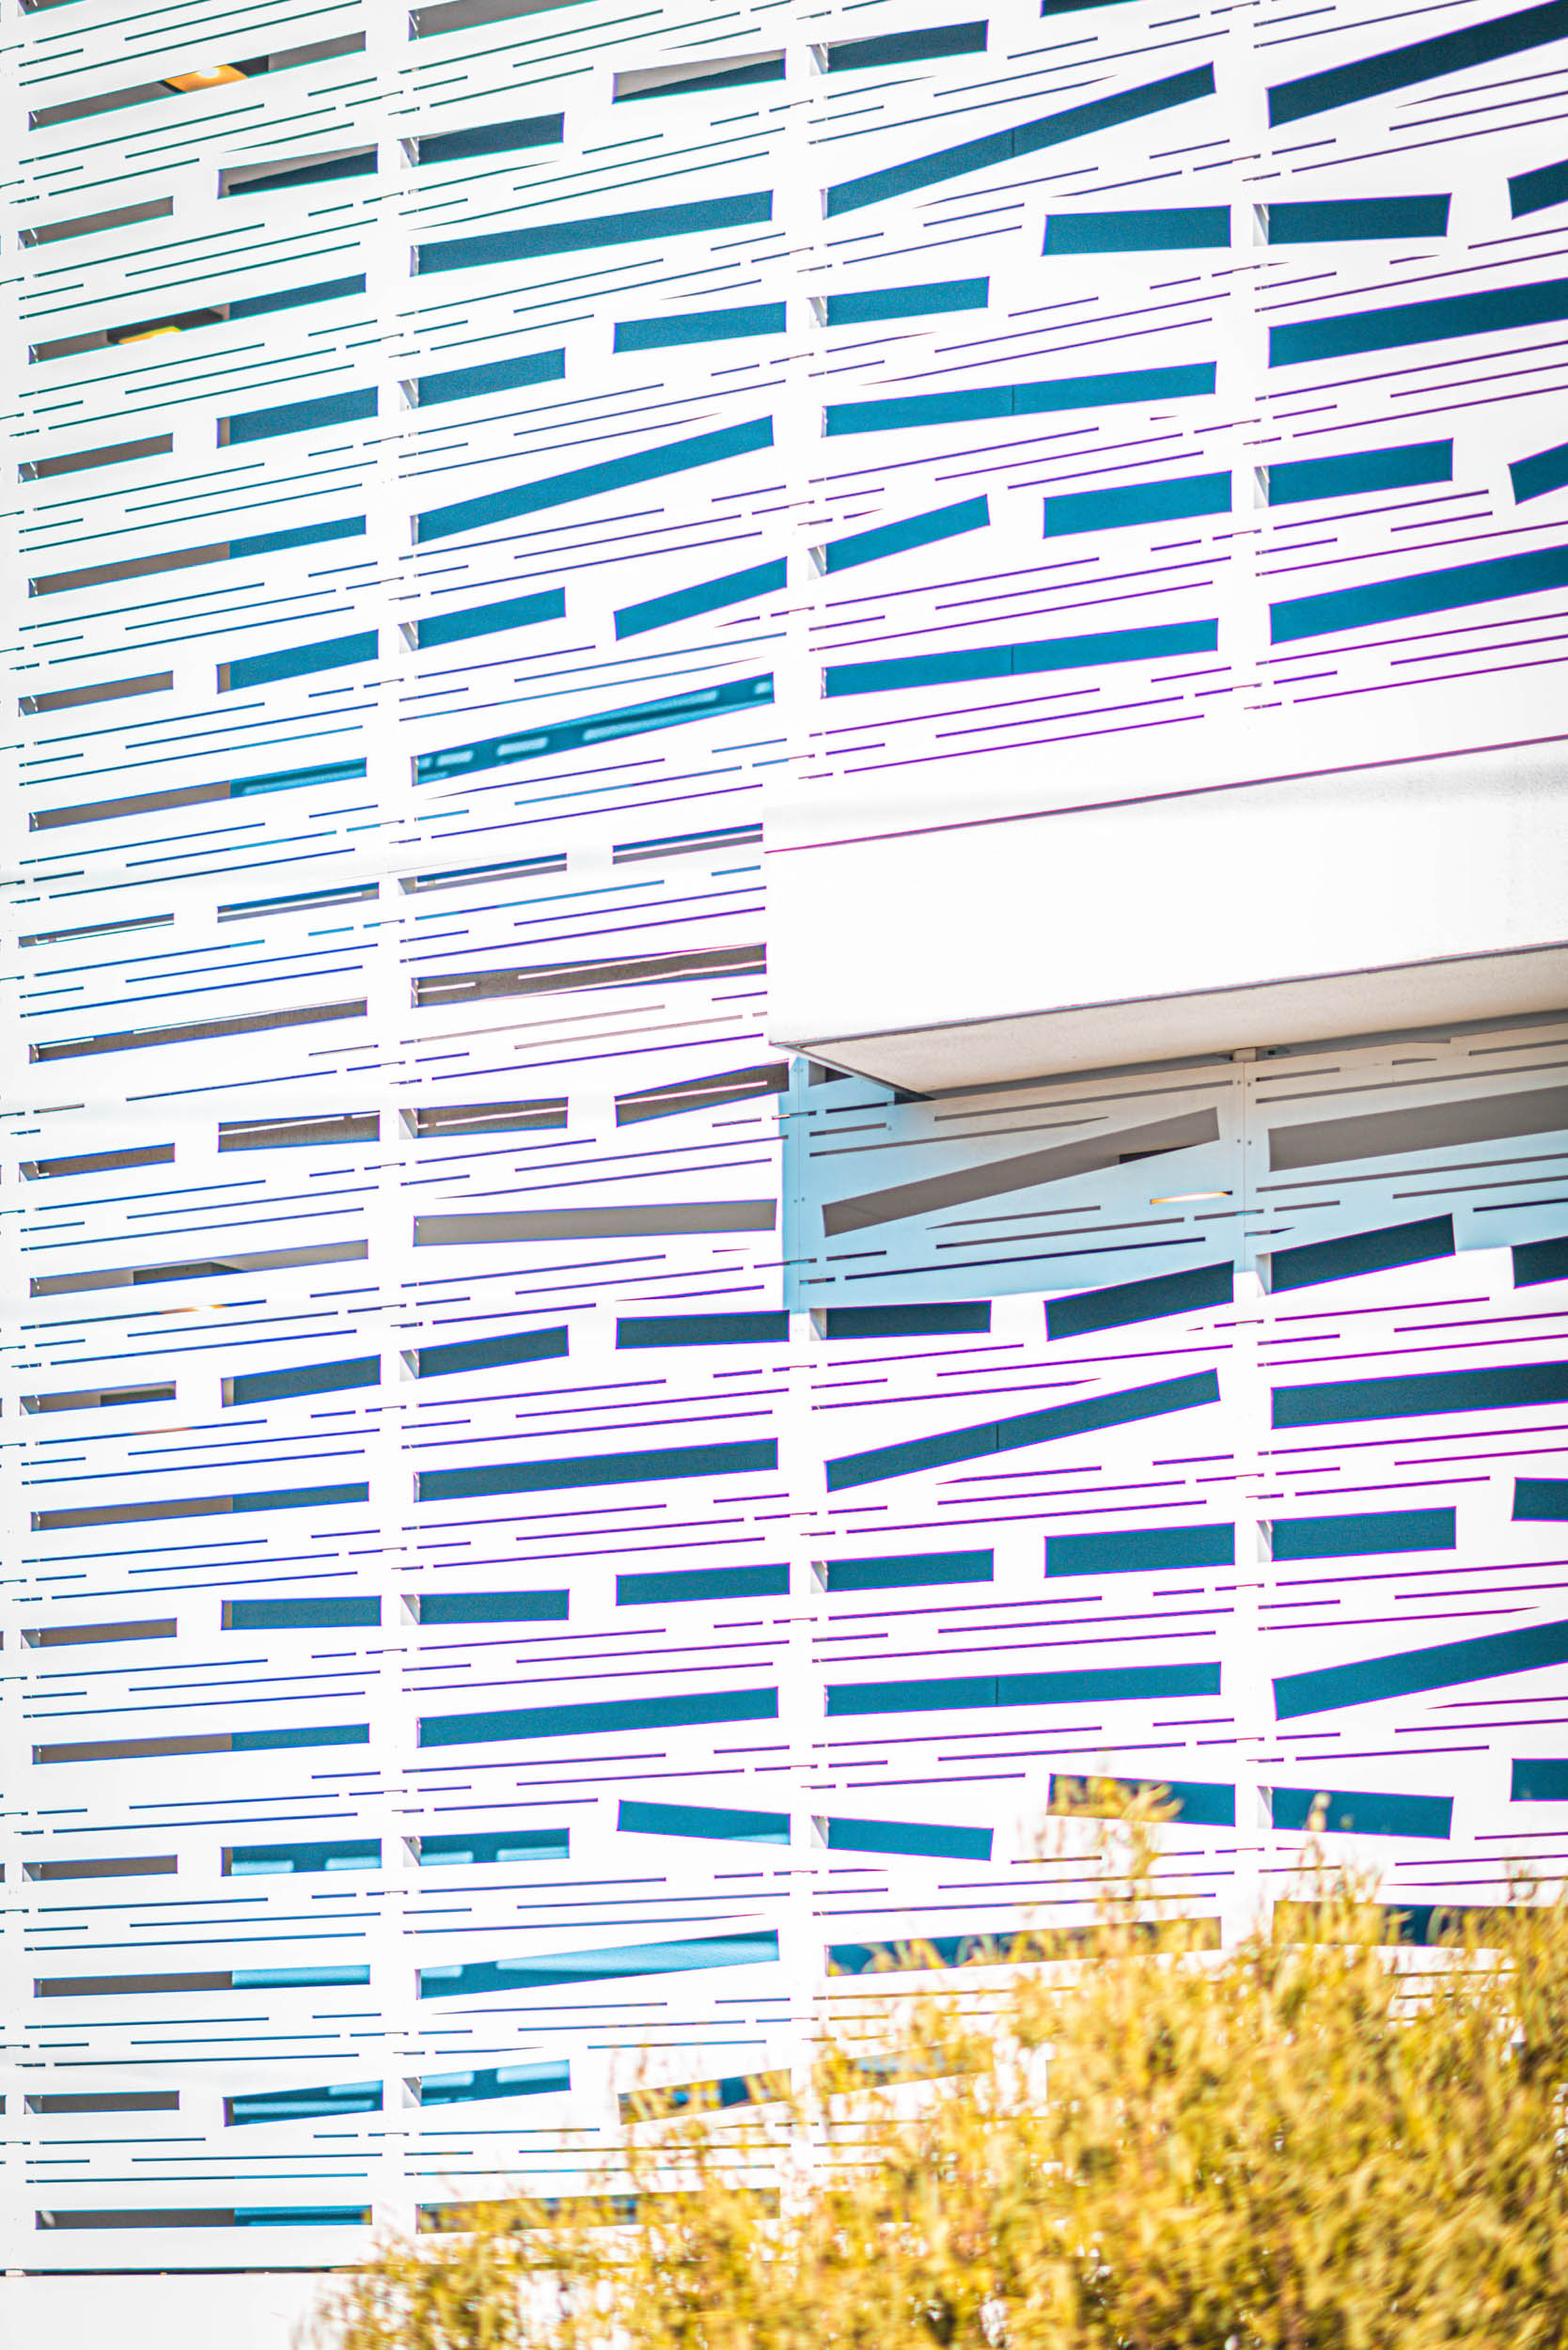 #EyesForLA, #NAINAxADOBE, adobe conference, adobe max, adobe max creativity conference, adobe max creativity conference los angeles, adobemax19, adobemax2019, America, Los Angeles, naina redhu, naina.co, usa, adobe max insiders summit, insiders summit, adobeinsiders, adobe insiders, universal studios, universal studios tour, hop on hop off, los angeles city tour, lunch, architecture